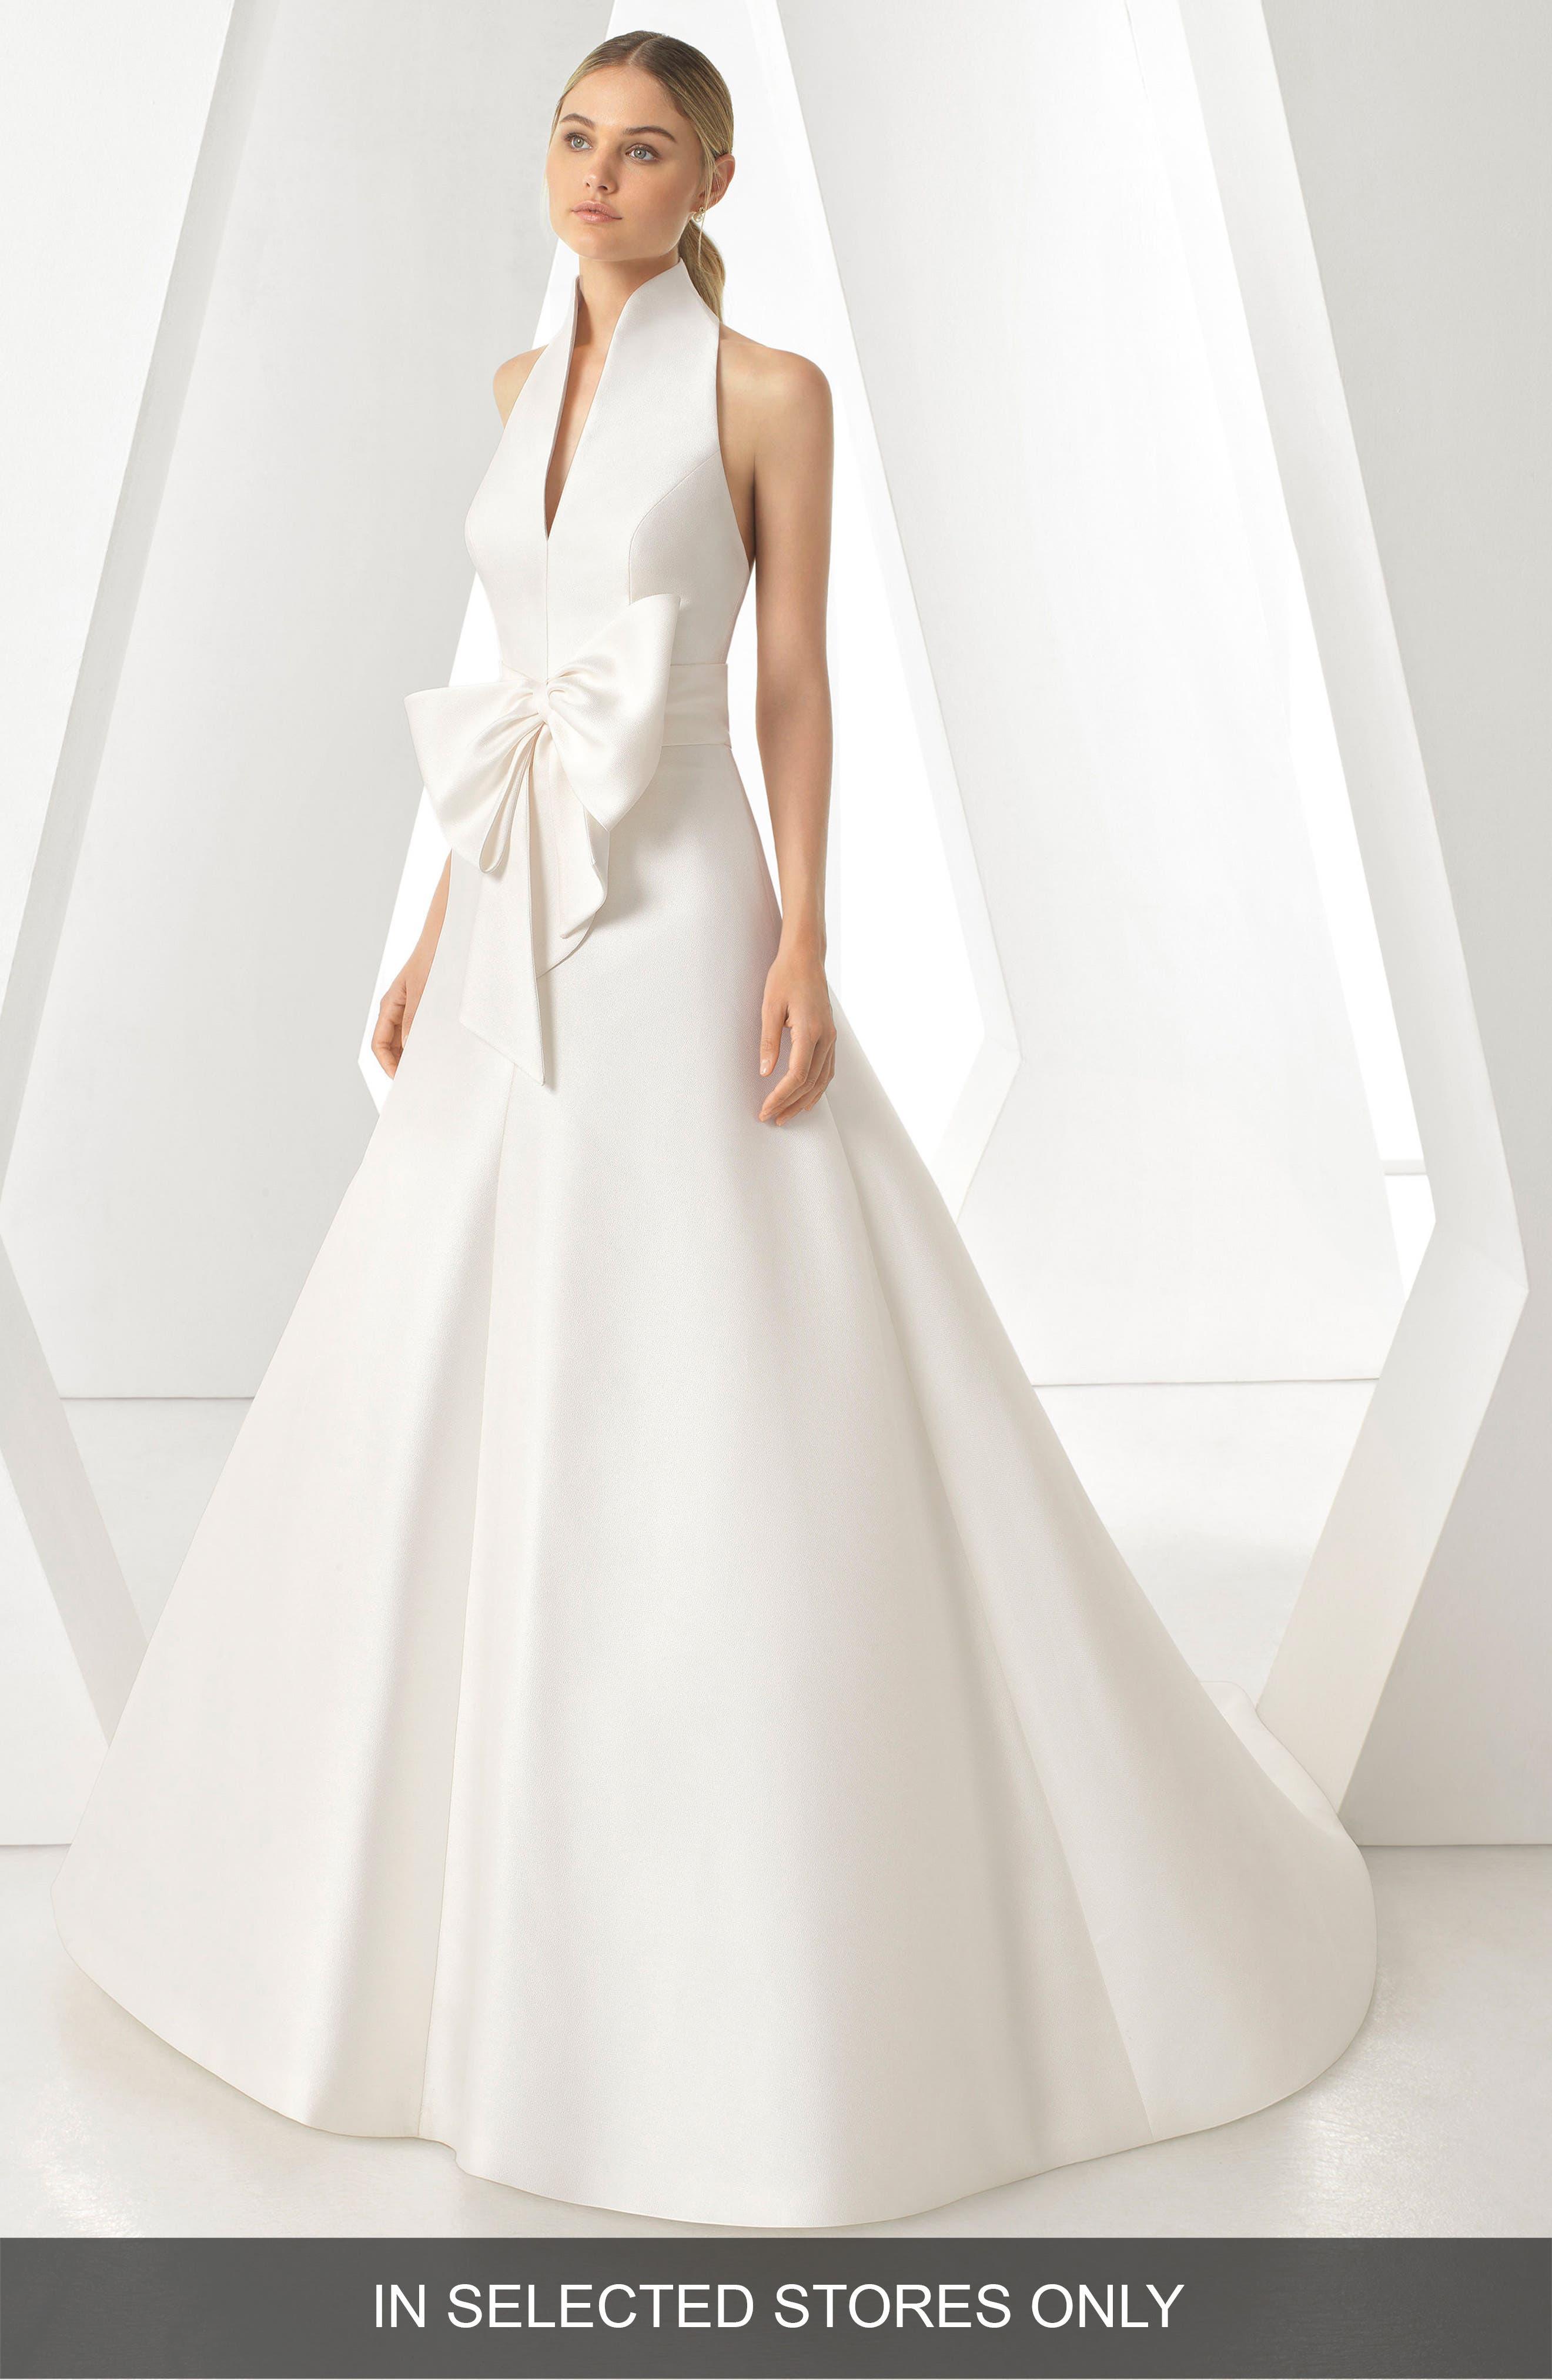 Halter Ball Gown Wedding Dresses